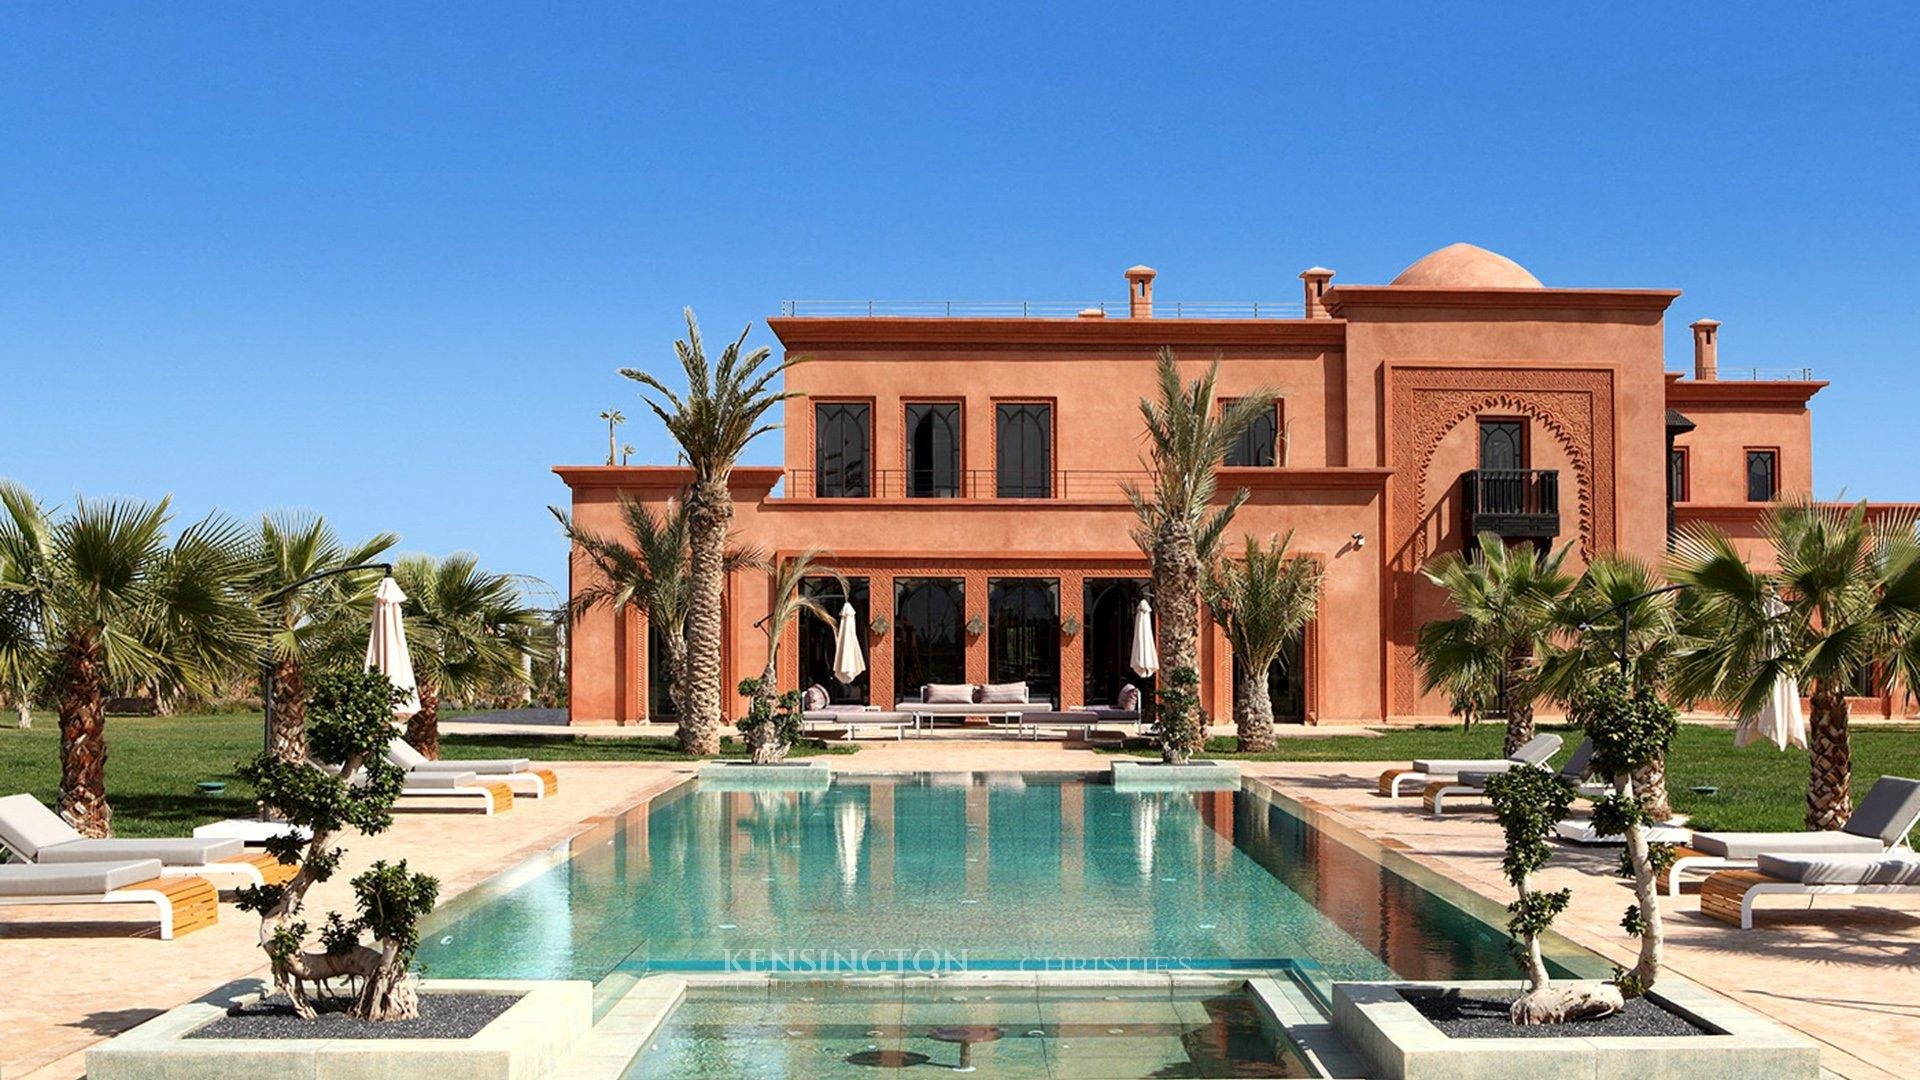 Mahal villa luxury villa marrakech kensington morocco for Villa des jardins marrakech